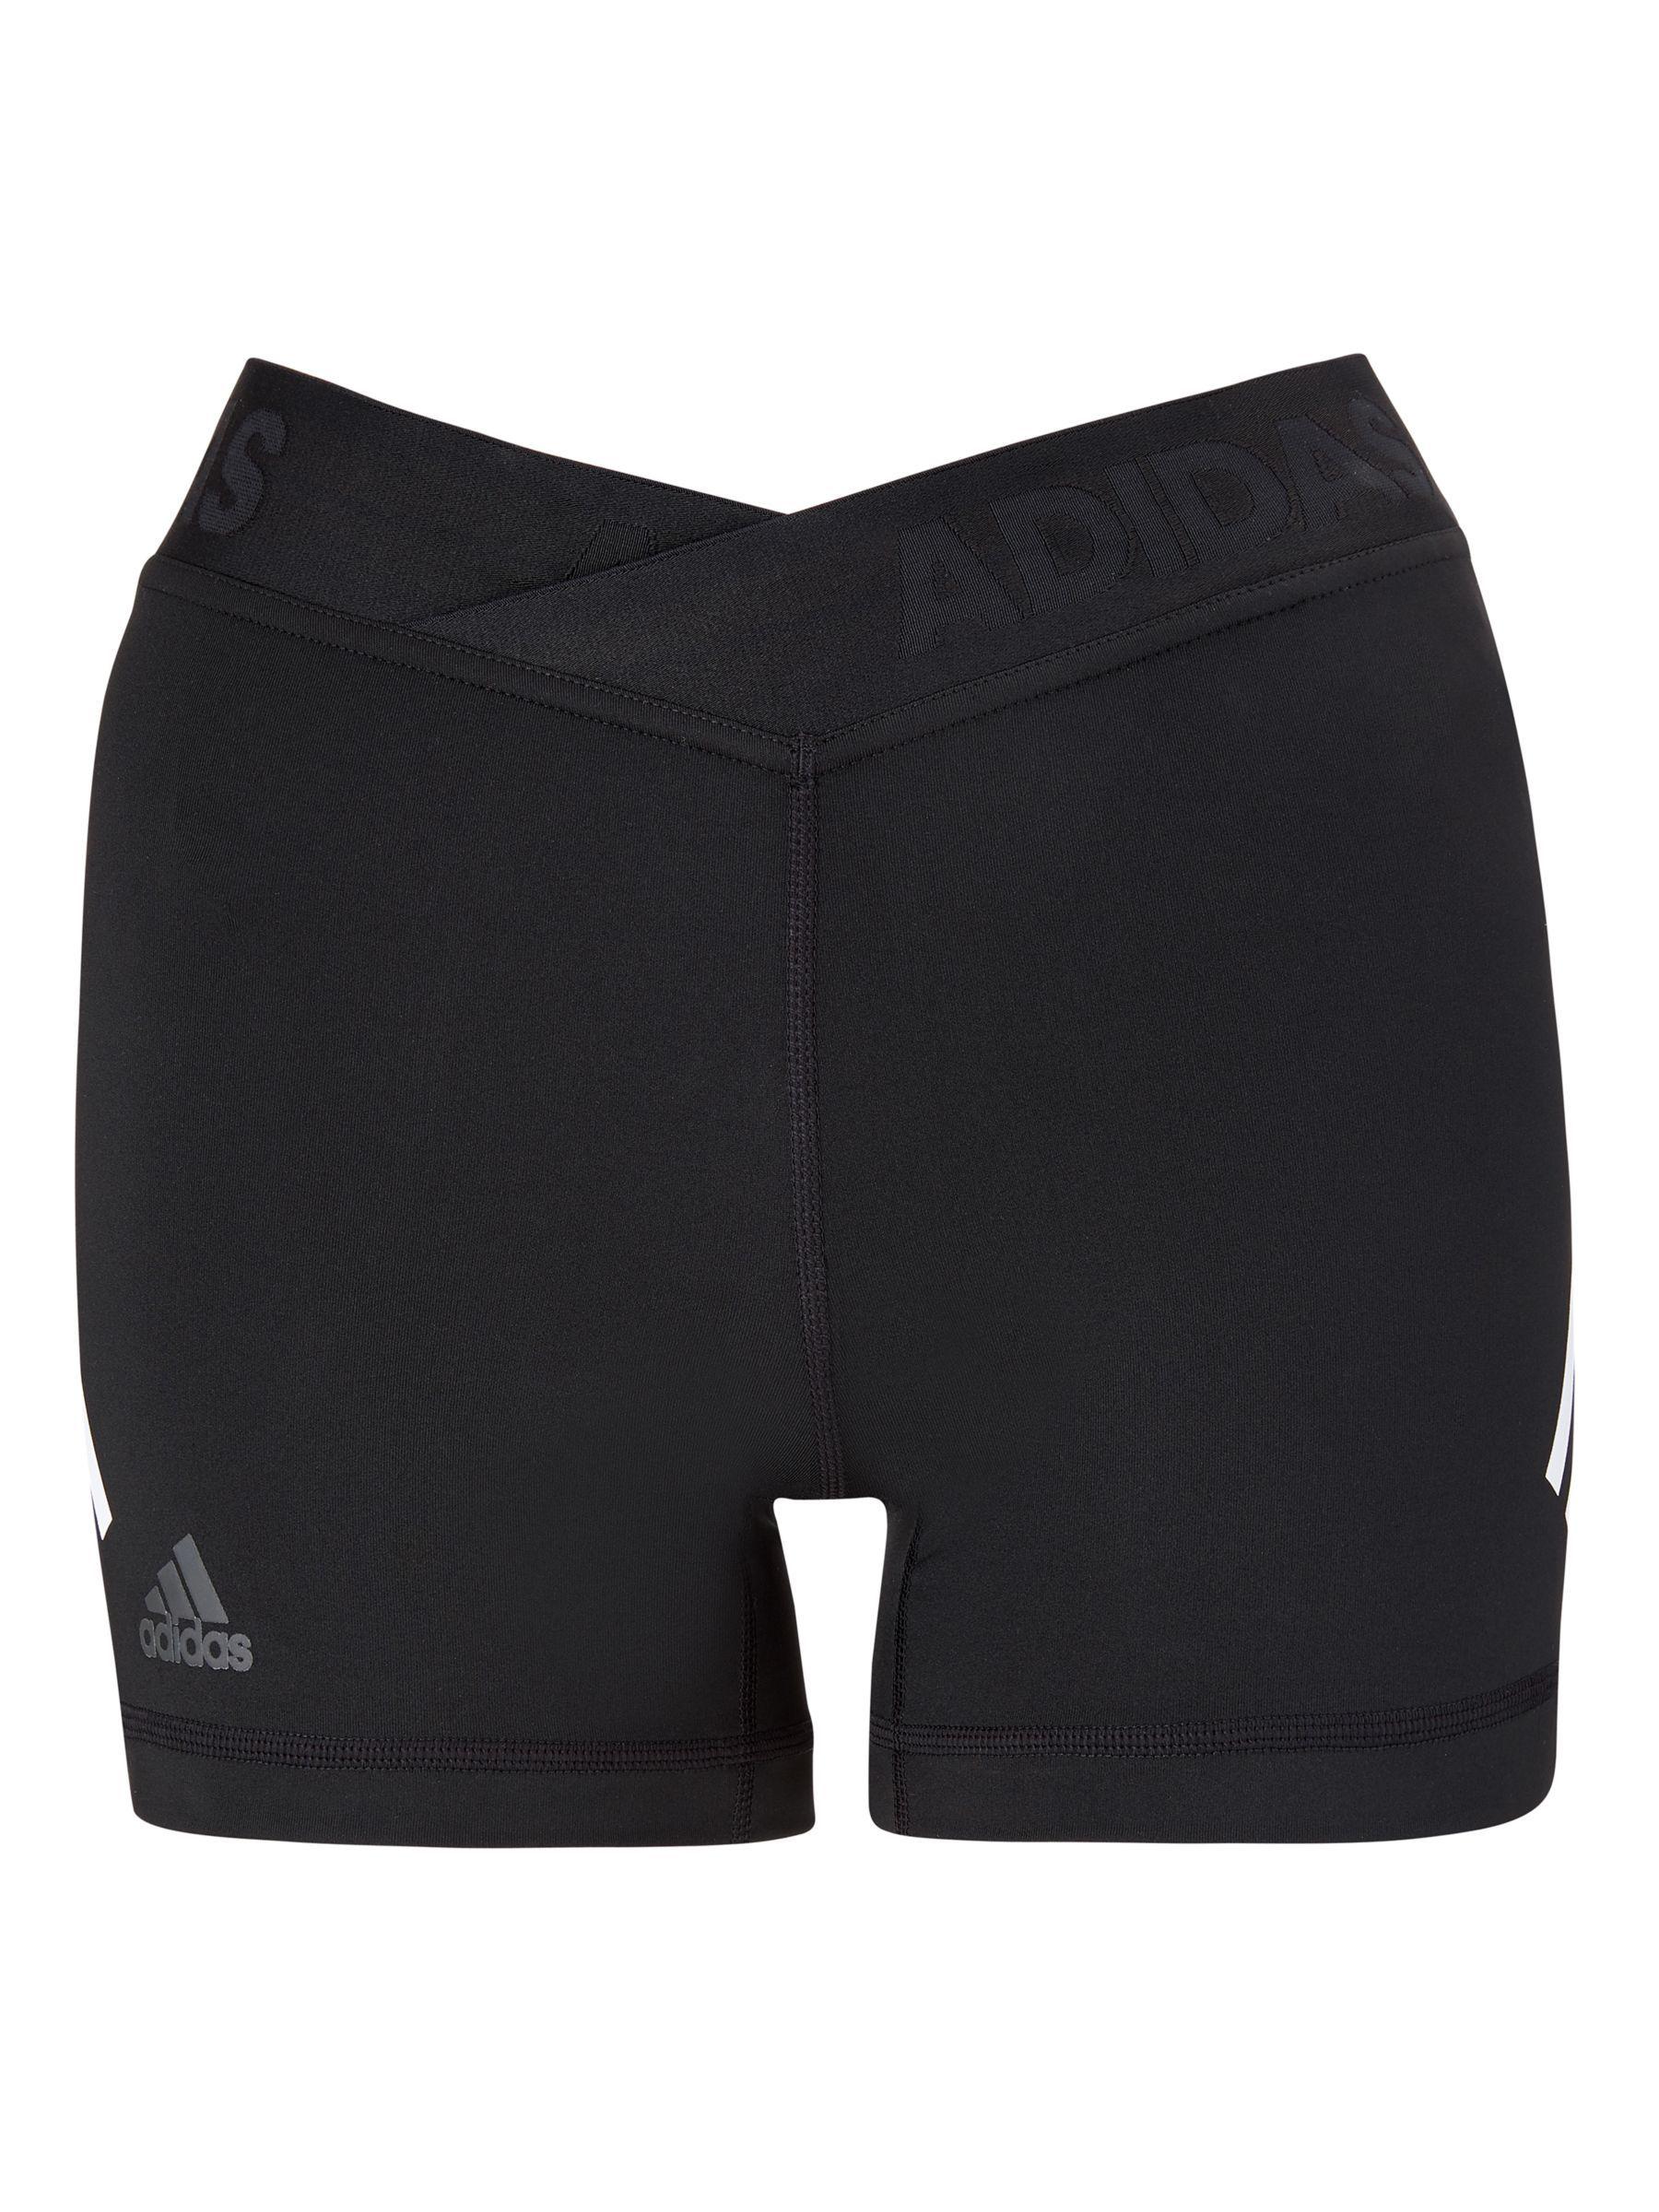 adidas Alphaskin Sport 3 Stripes Short Tights, Black